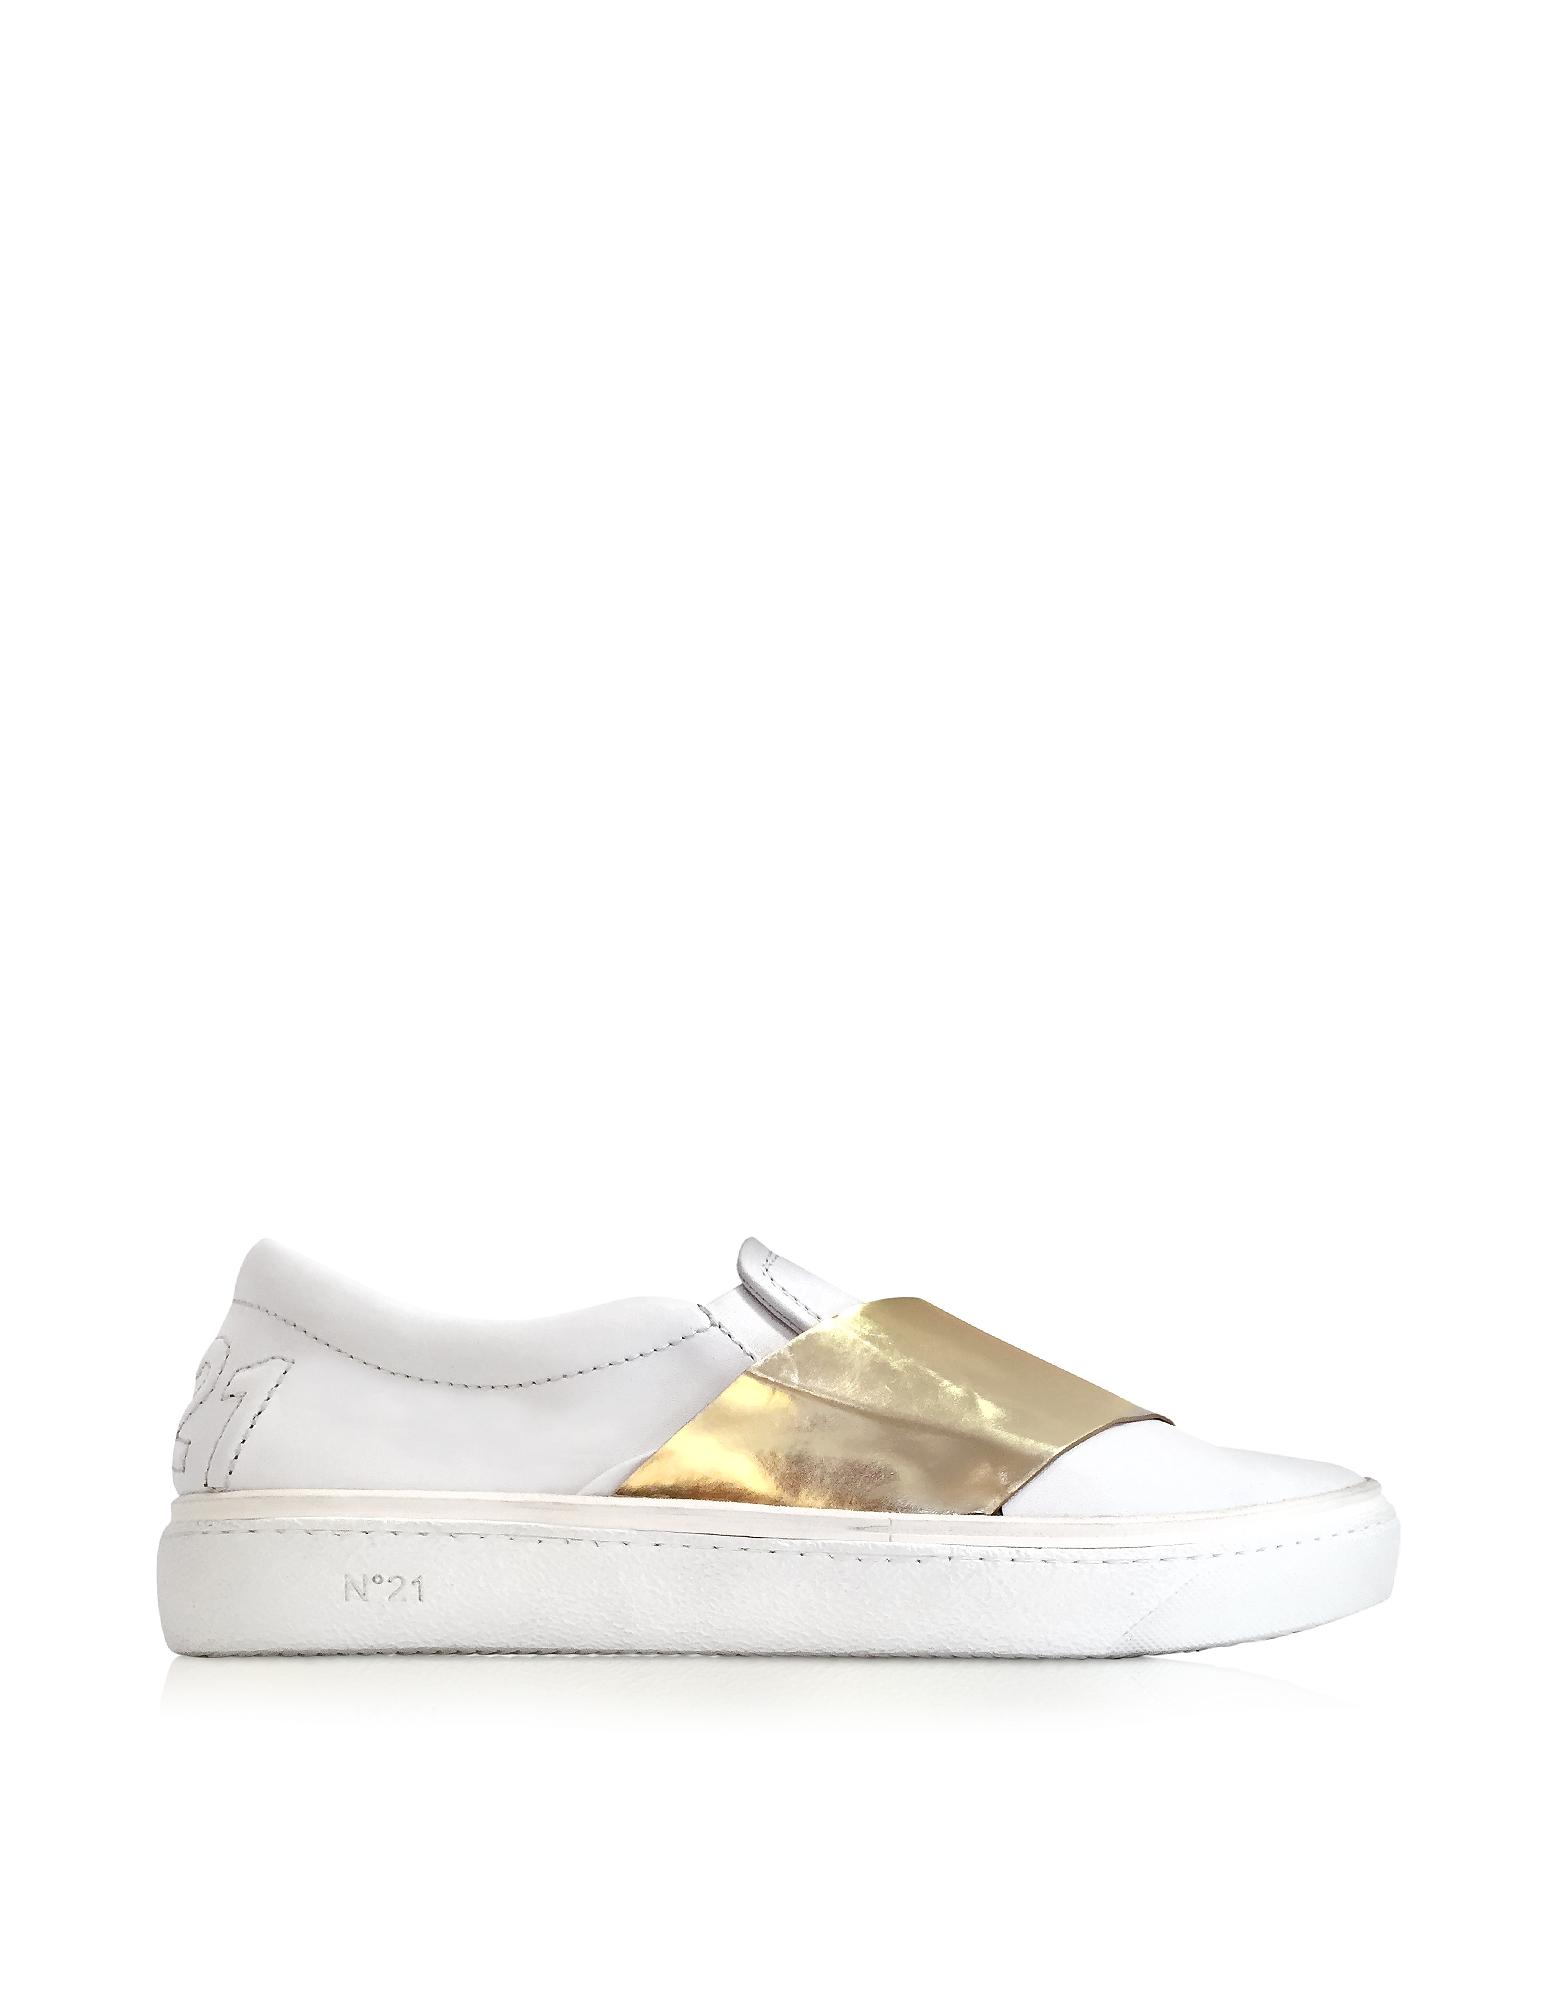 N°21 Shoes, White & Gold Metallic Leather Slip-on Sneaker